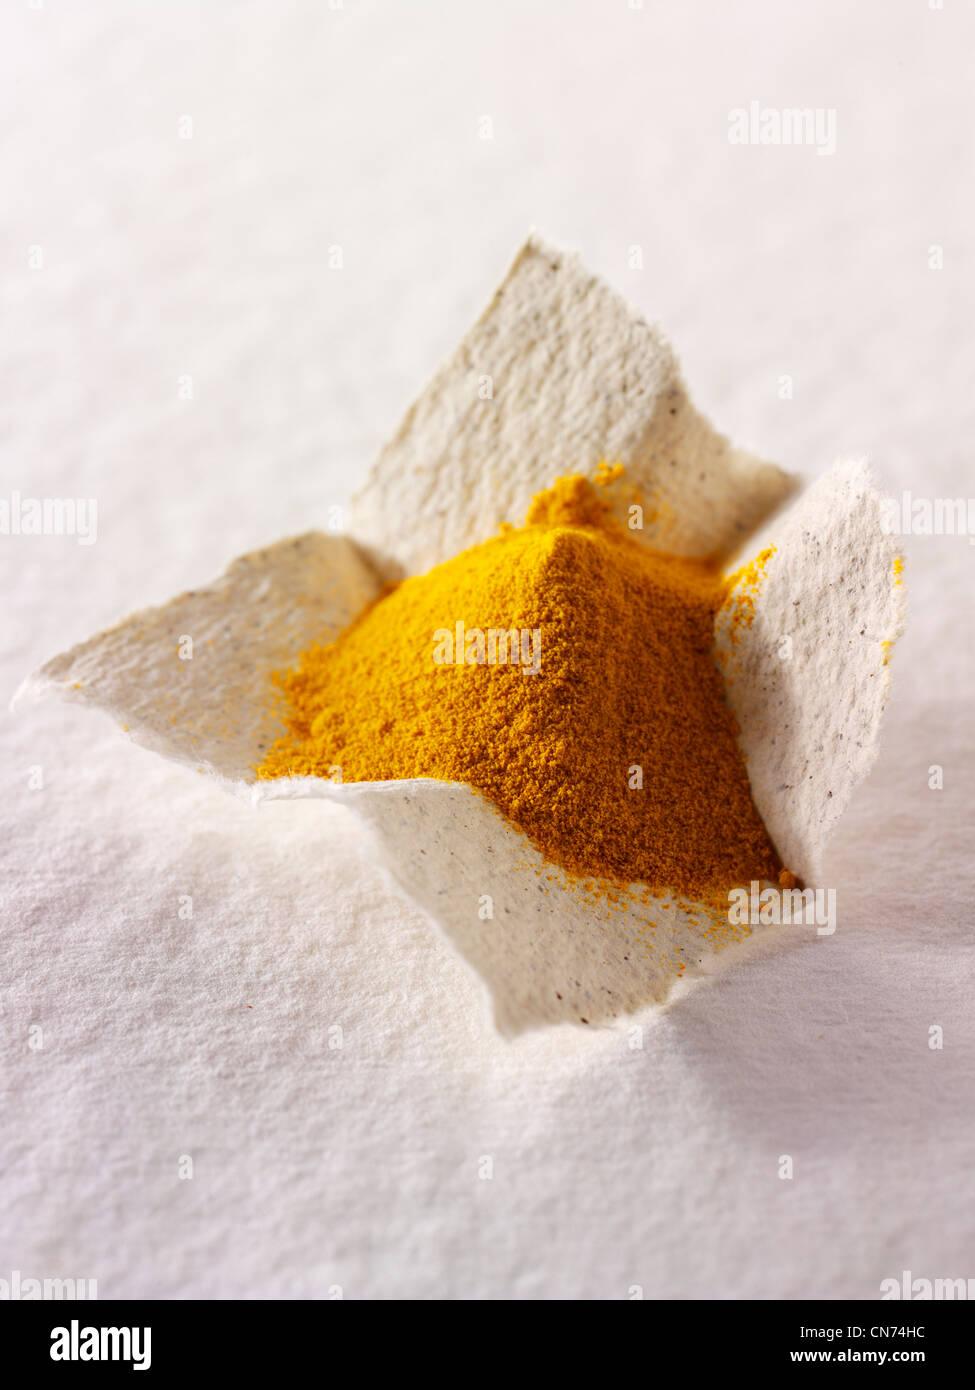 Curcuma in polvere spezie in polvere Immagini Stock